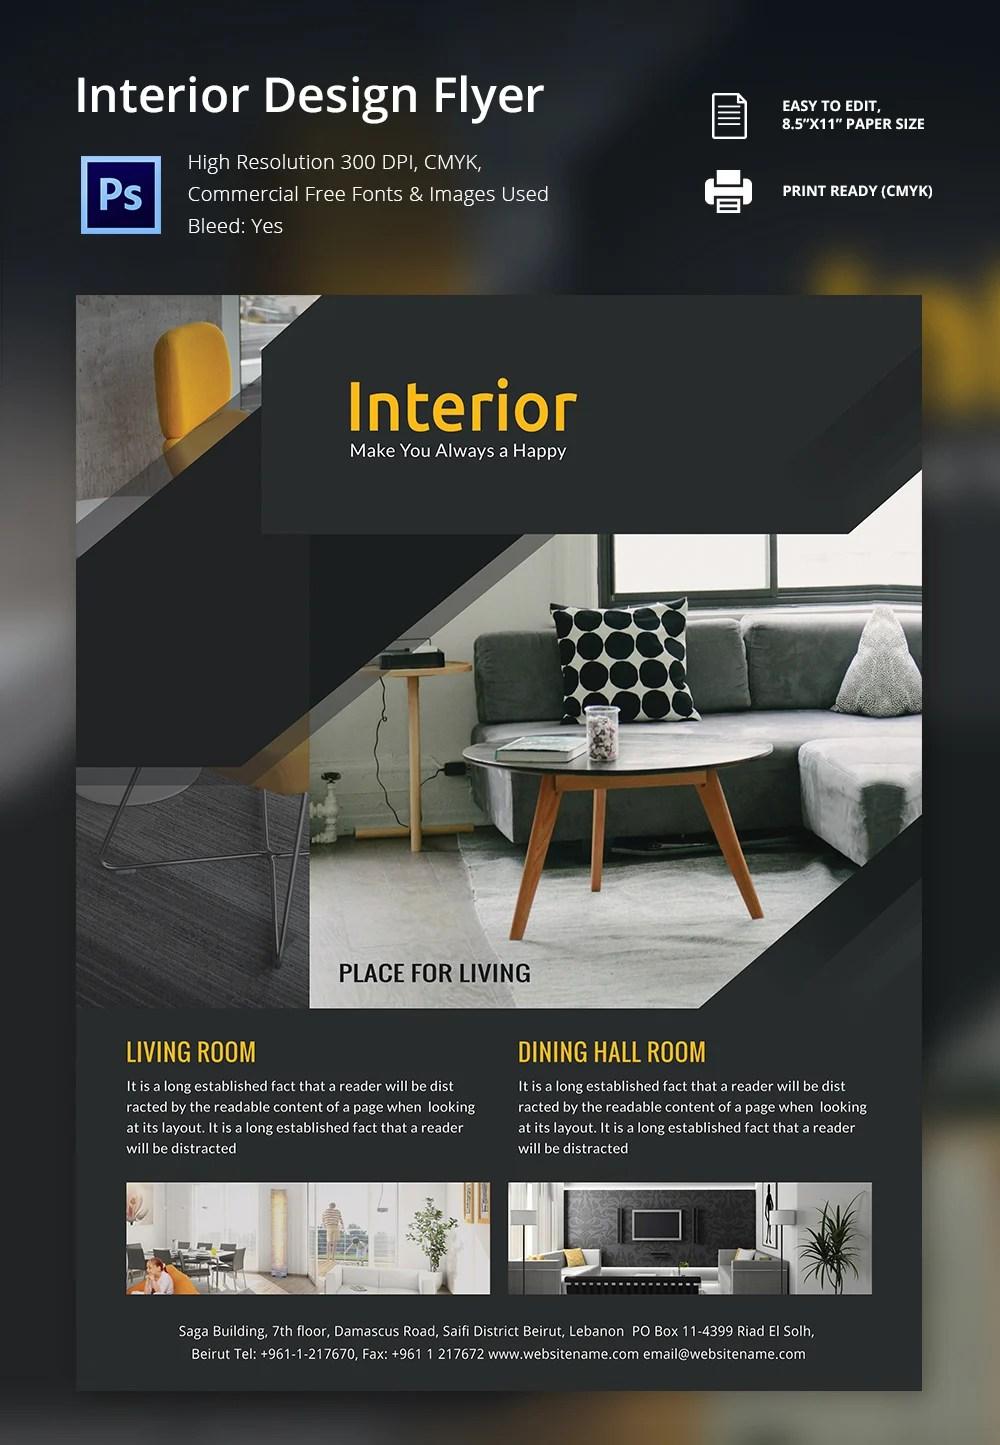 Interior Design Brochure 25 Free PSD EPS InDesign